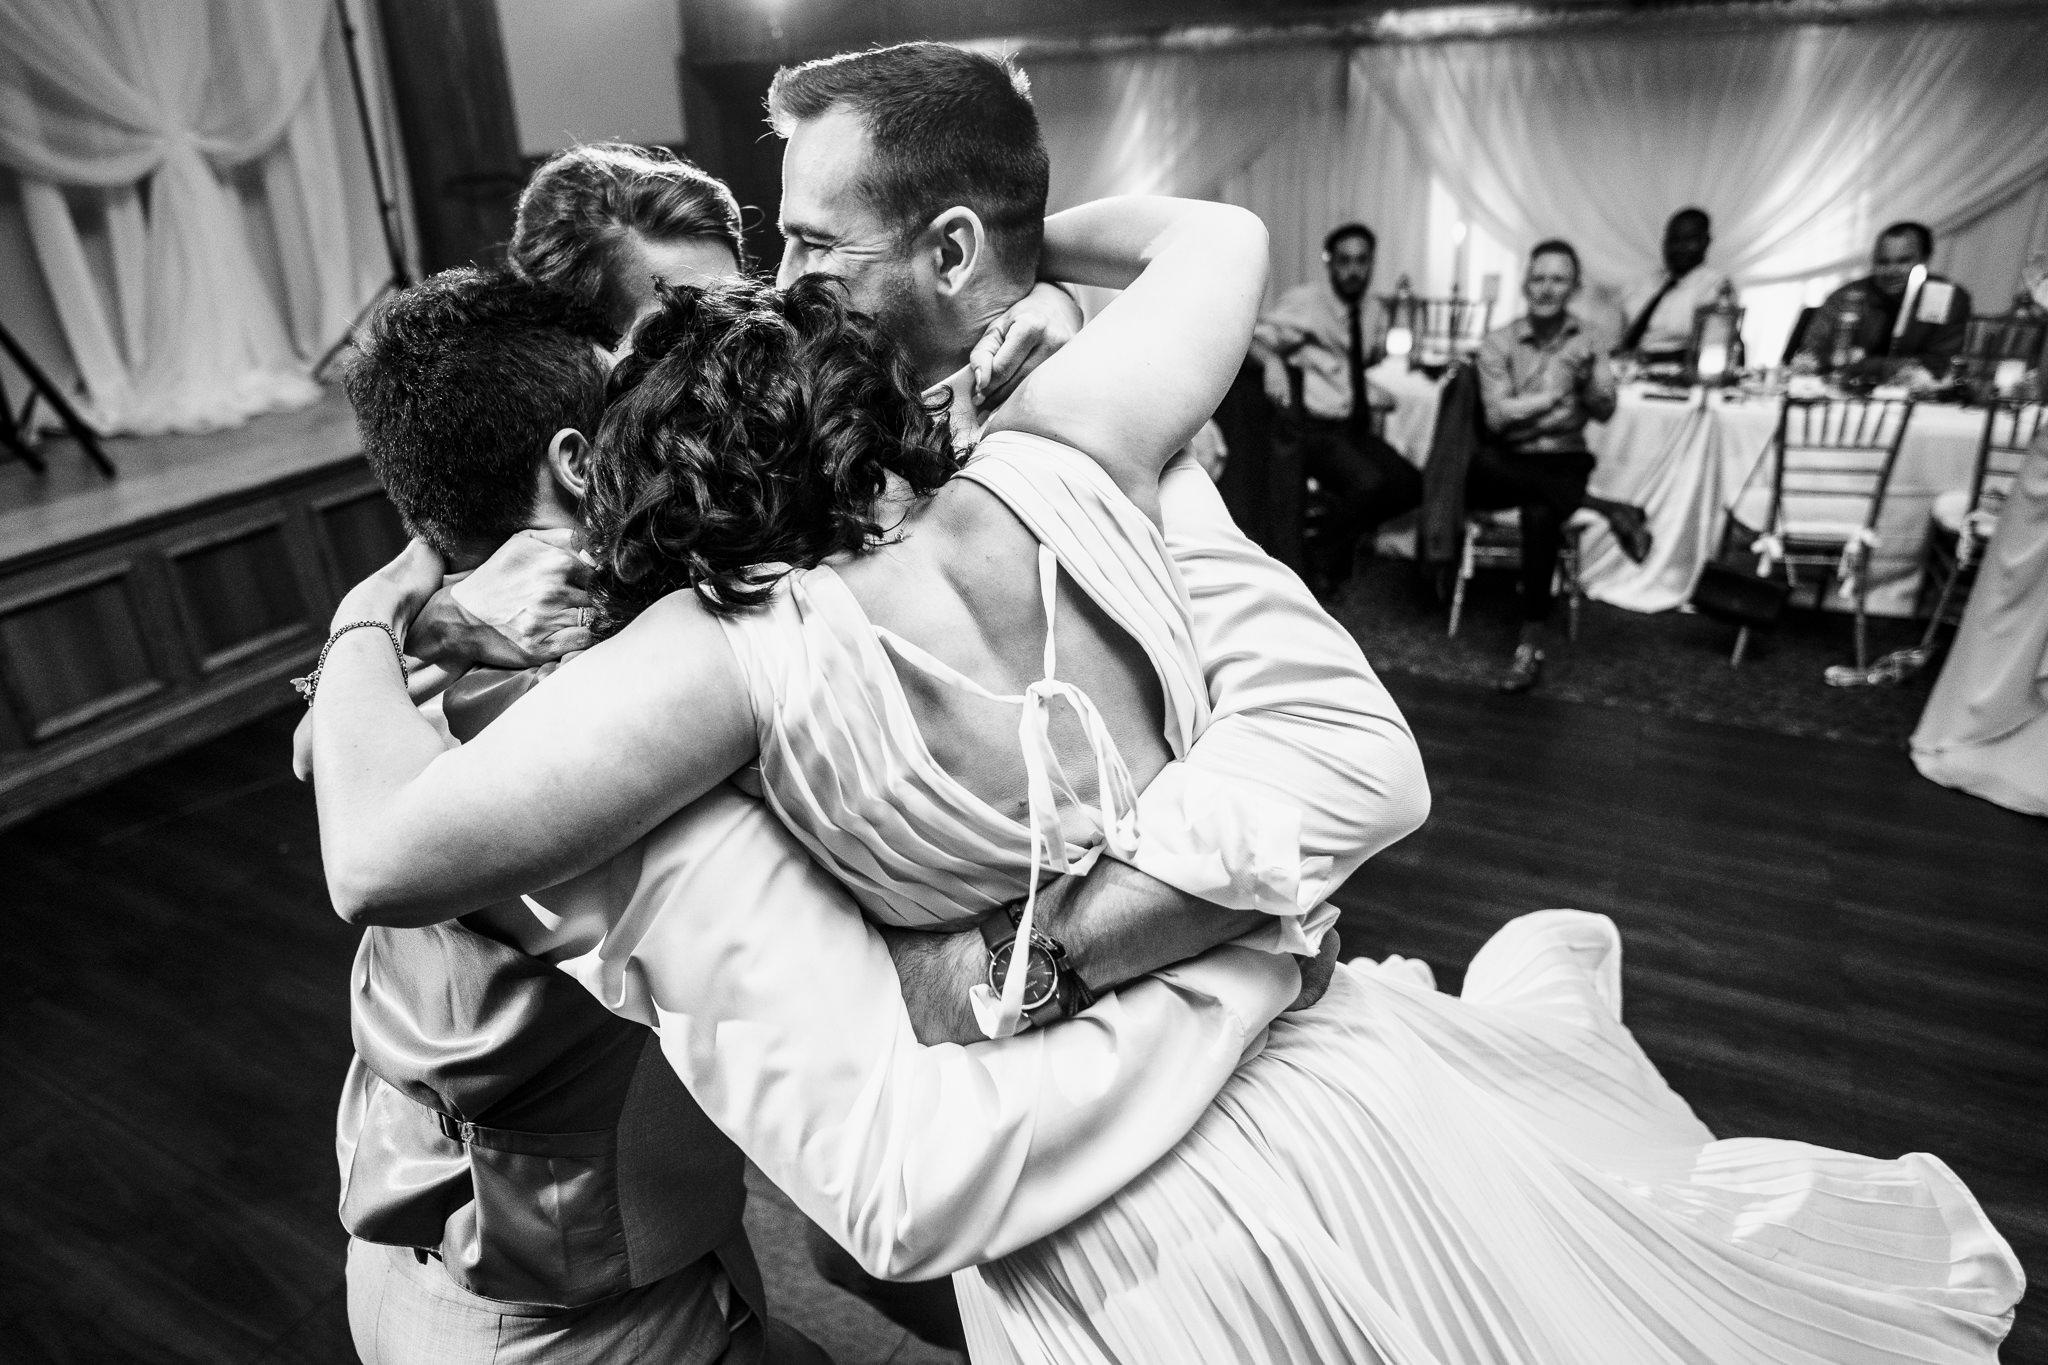 Barbato-Moorestown-Community-House-Wedding-New-Jersey-Photographer-41.JPG